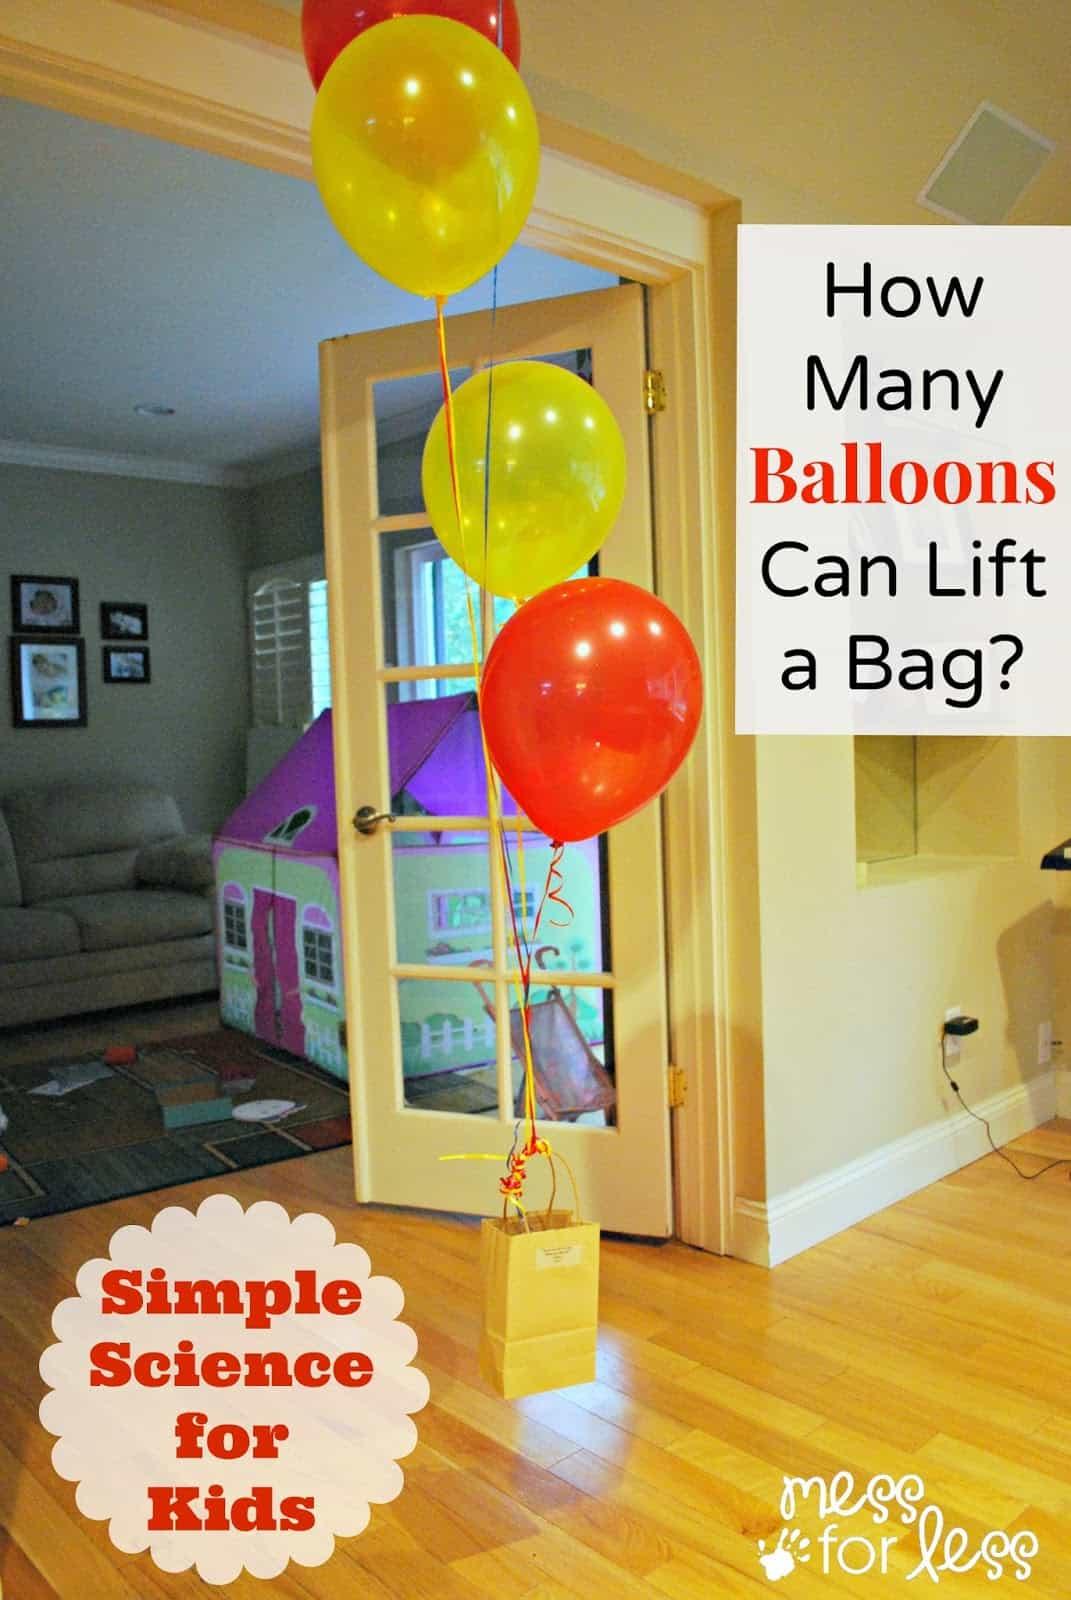 Simple Science For Preschoolers